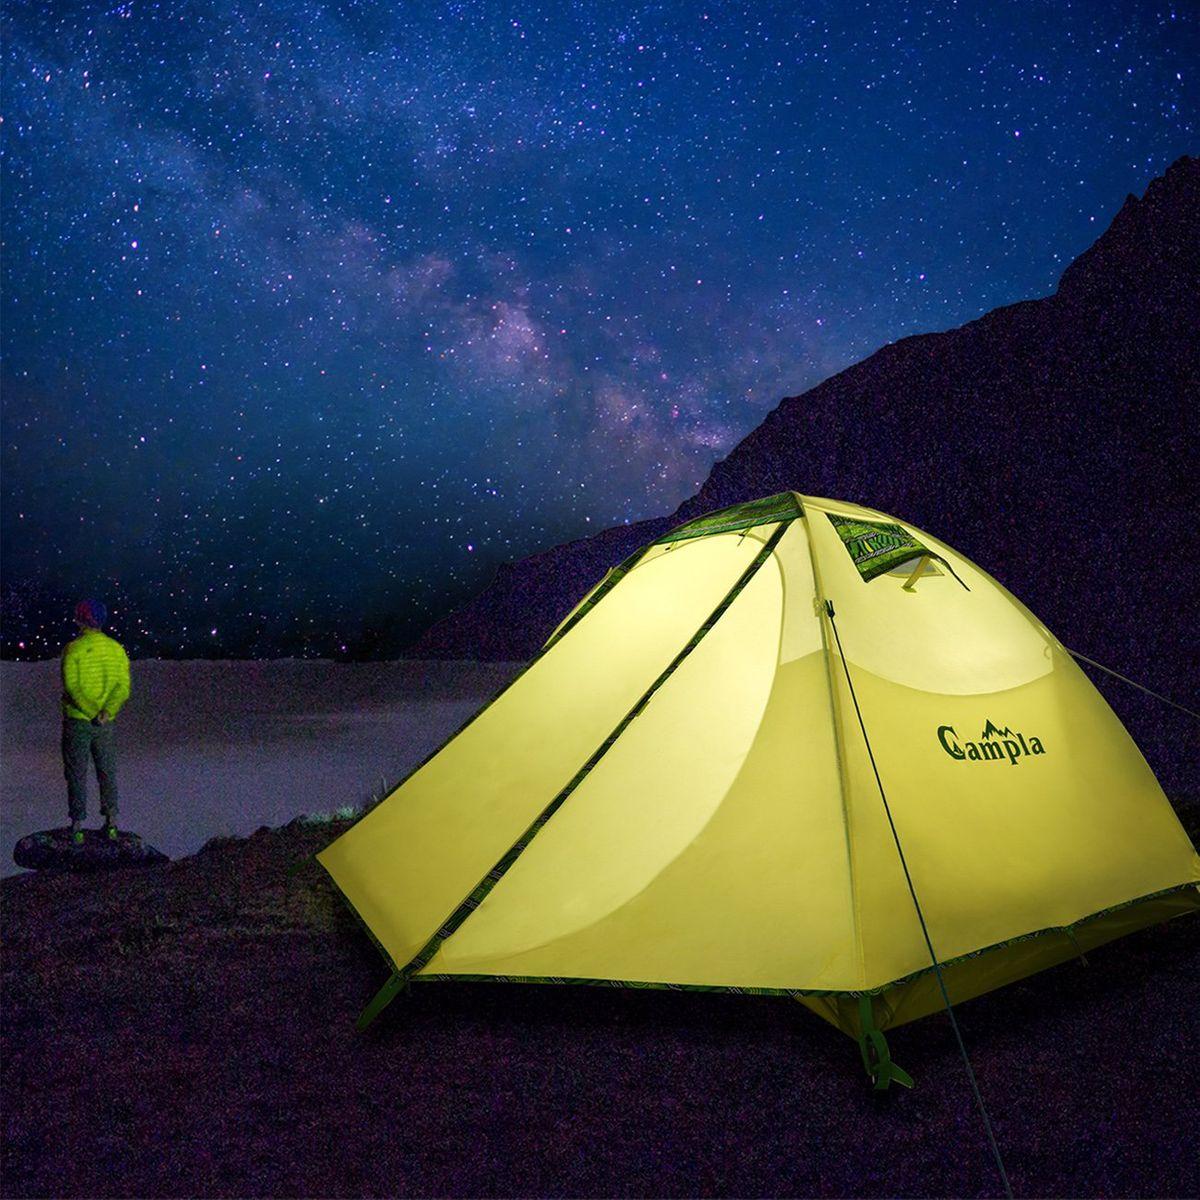 Camping Tent Black Cat Outdoor Light Bivvy Camping Light Camping Lantern